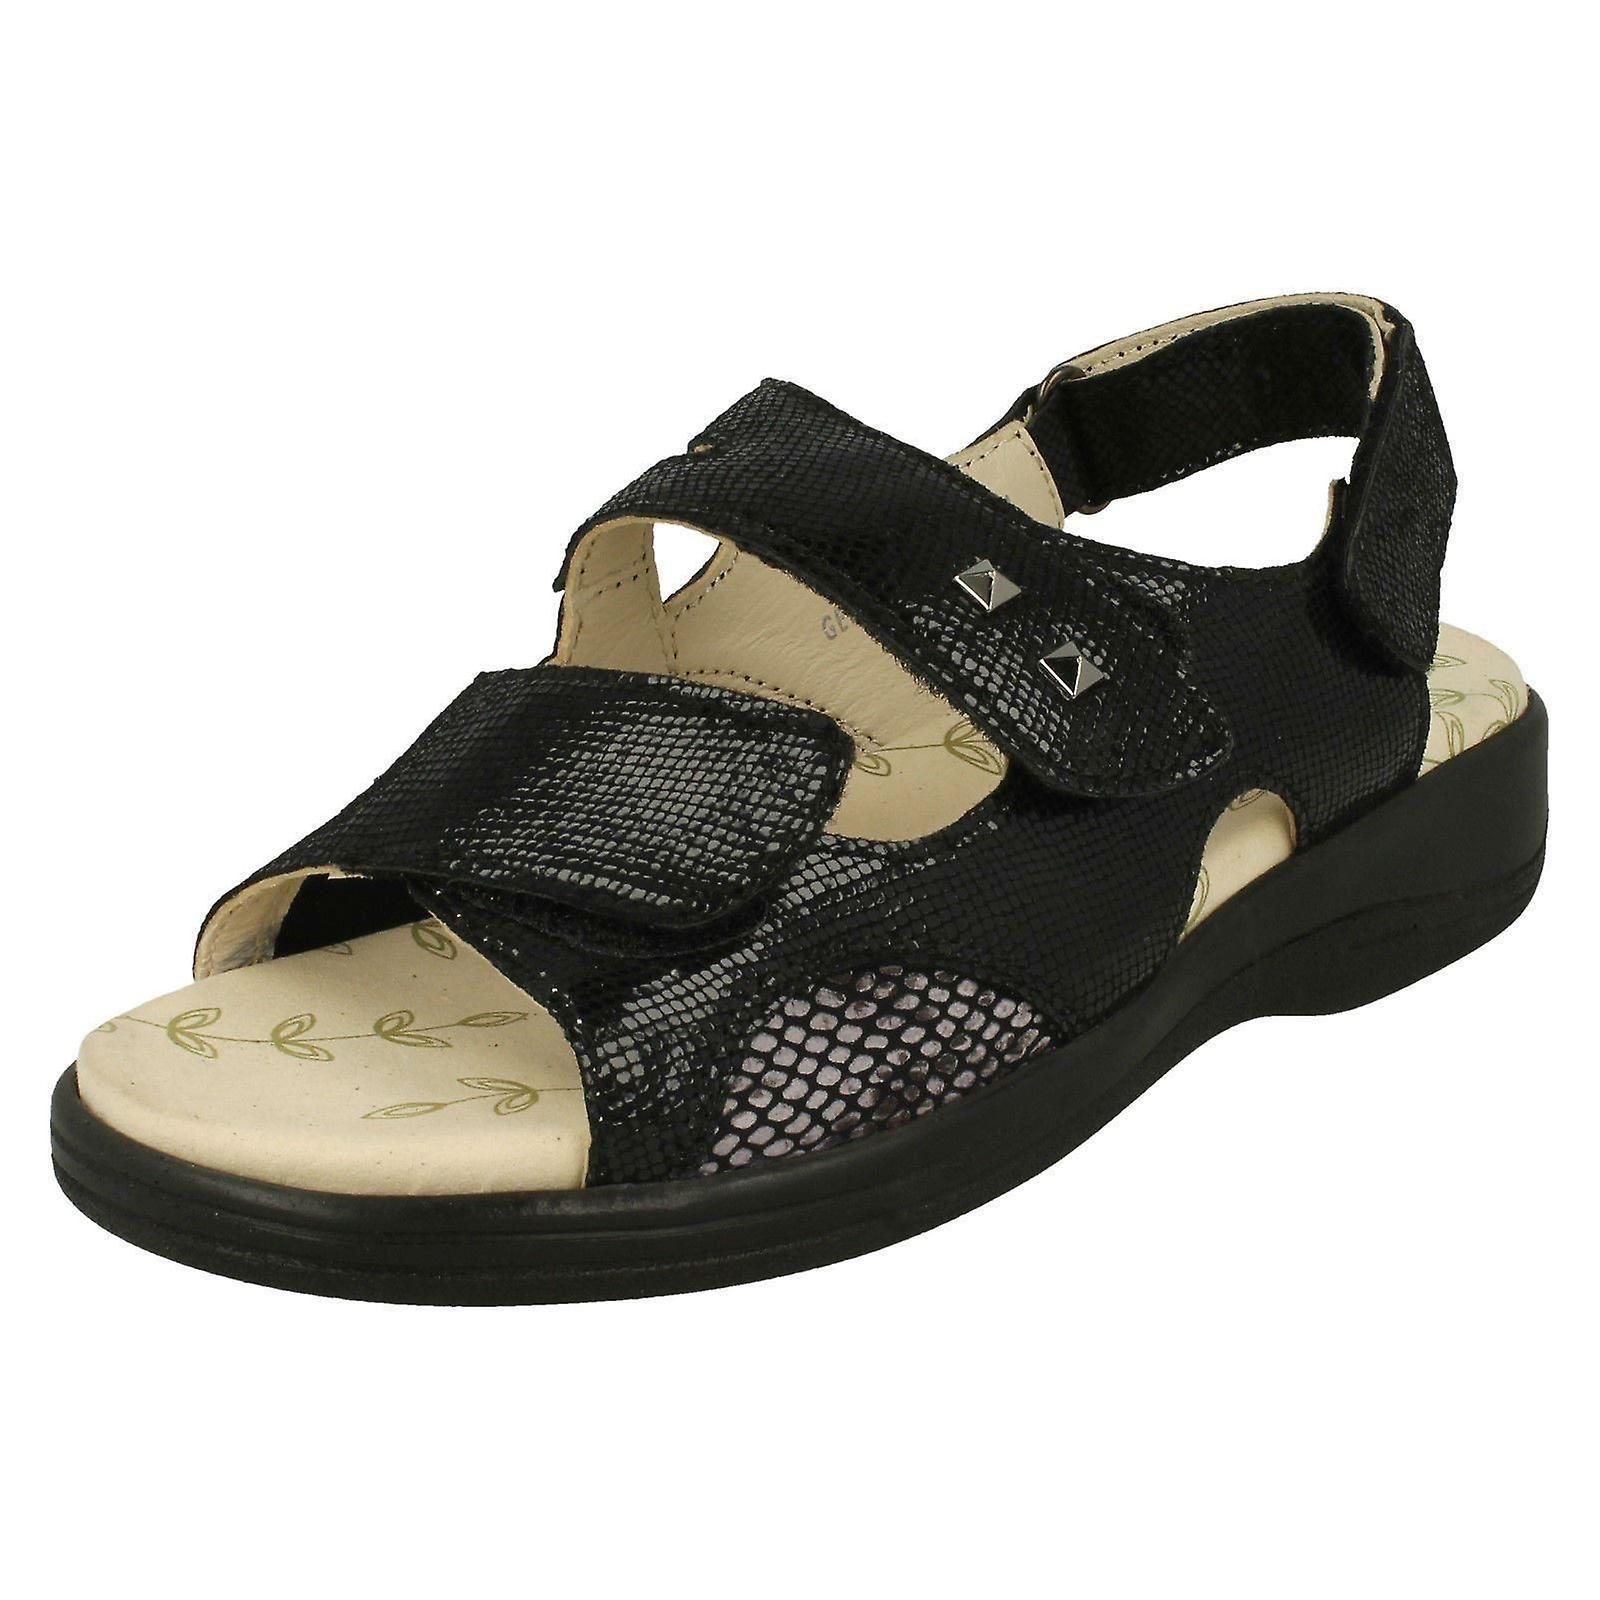 Ladies Padders Hook & Loop Fastening Sandals Gemstone - Black Reptile Leather - UK Size 6 3E/4E - EU Size 40 - US Size 8